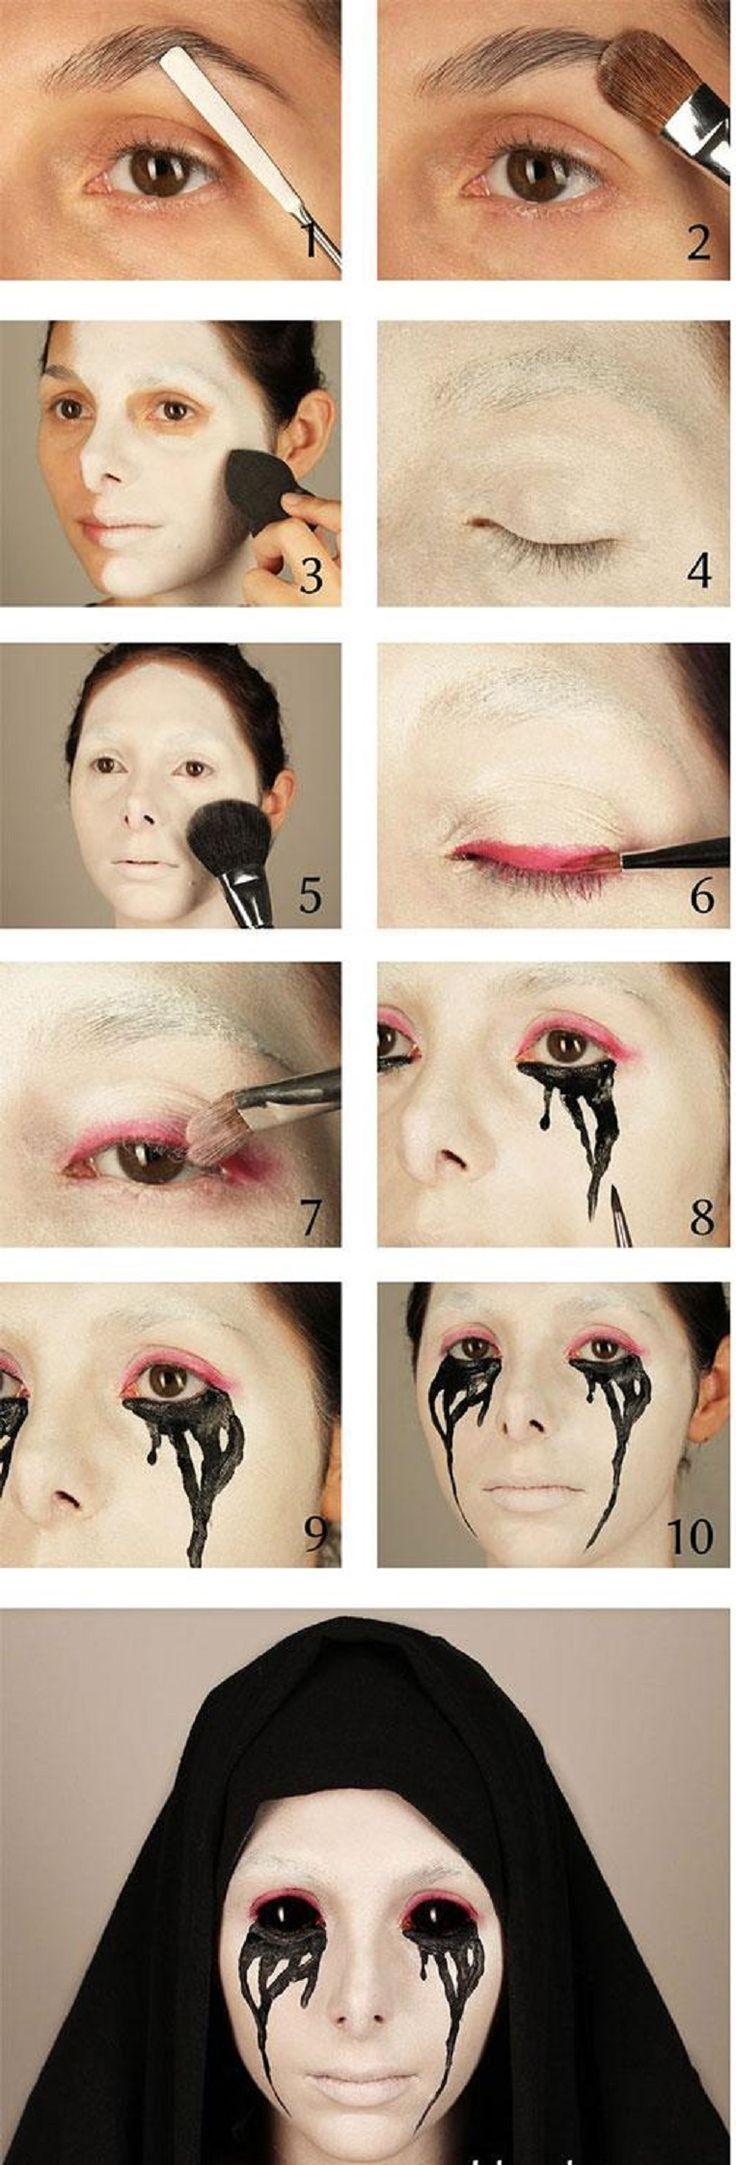 best ideas for makeup tutorials : halloween makeup tutorial: scary